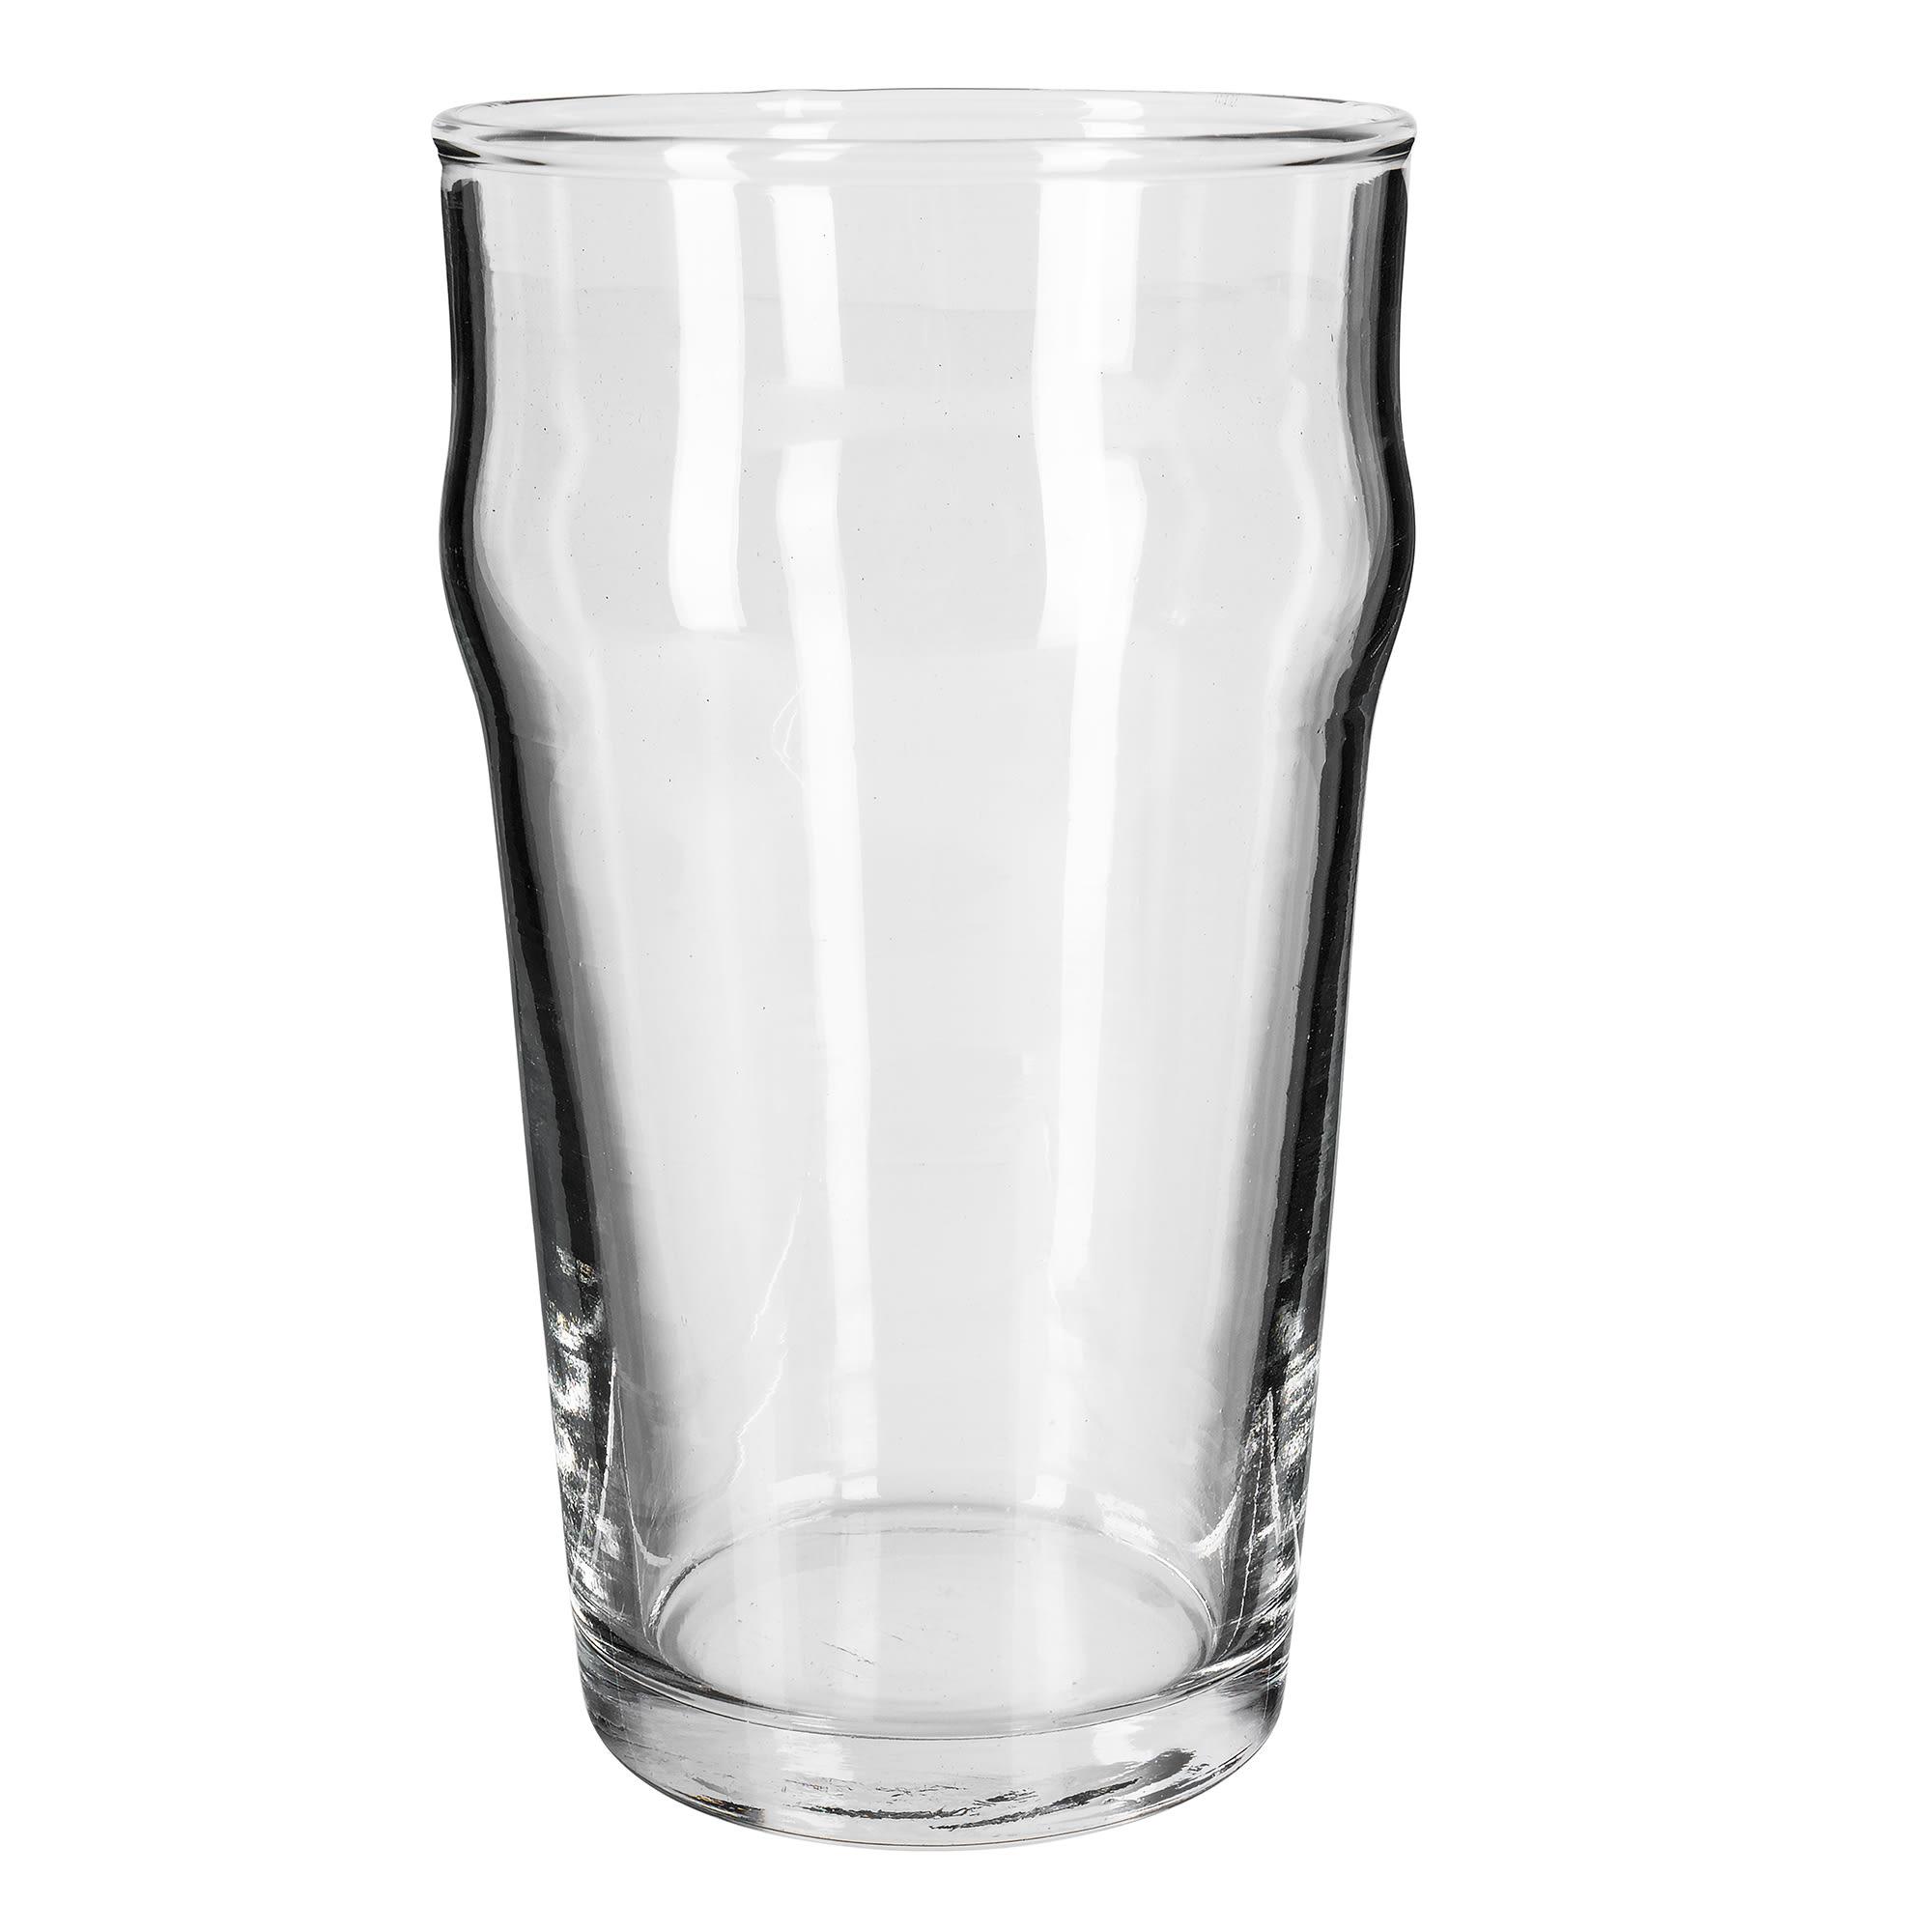 Anchor 90244 English Pub Glass, 20-oz w/ Tempered Rim